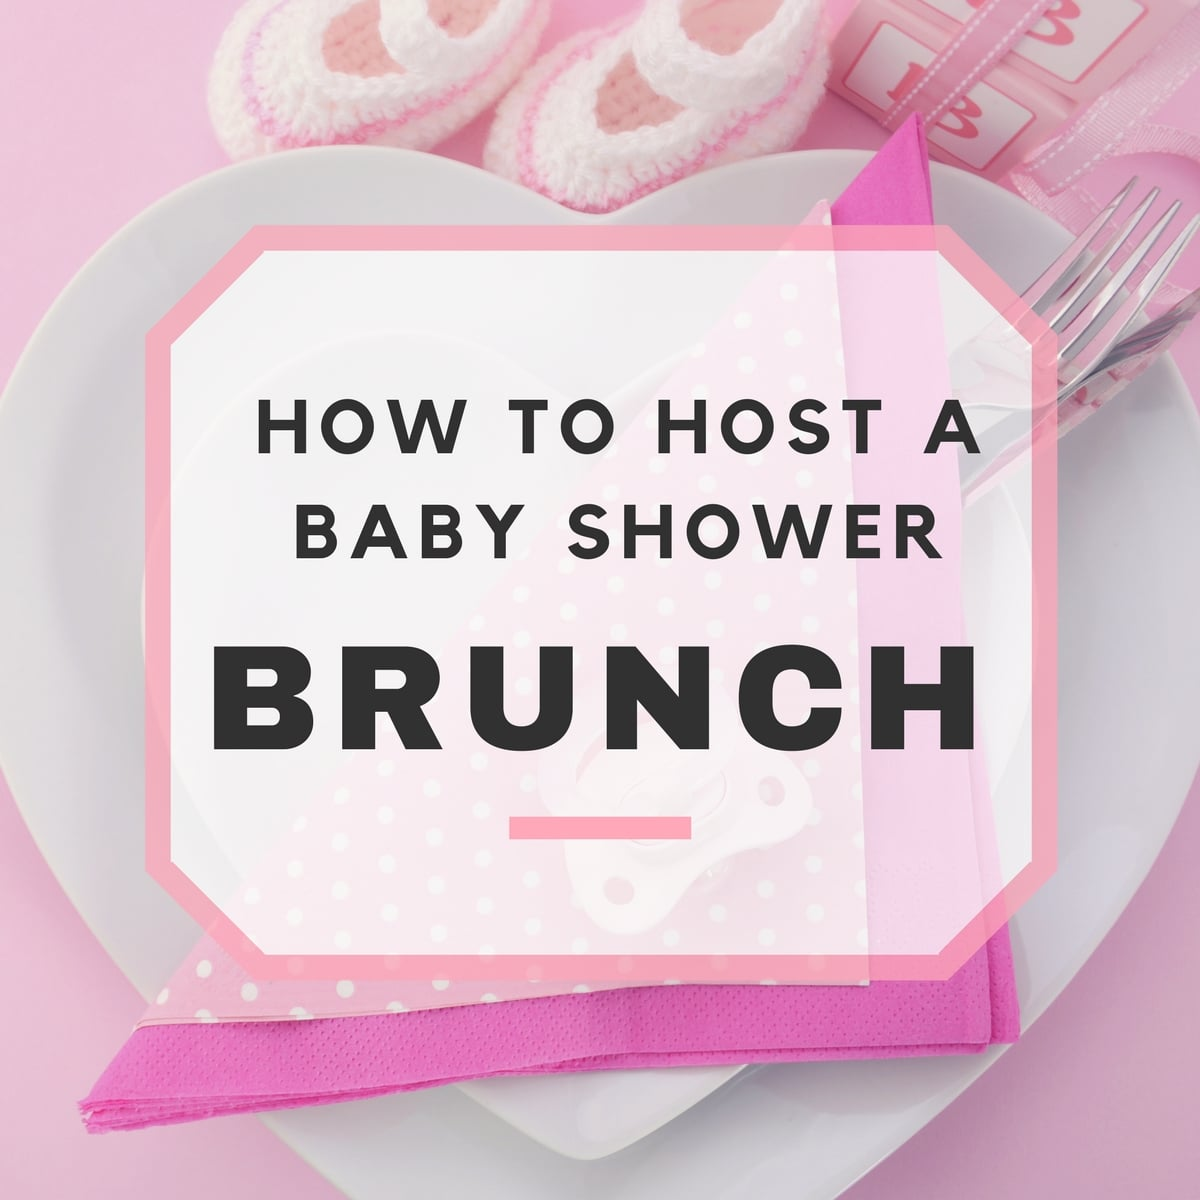 Baby Shower Brunch Ideas & Sample Menu